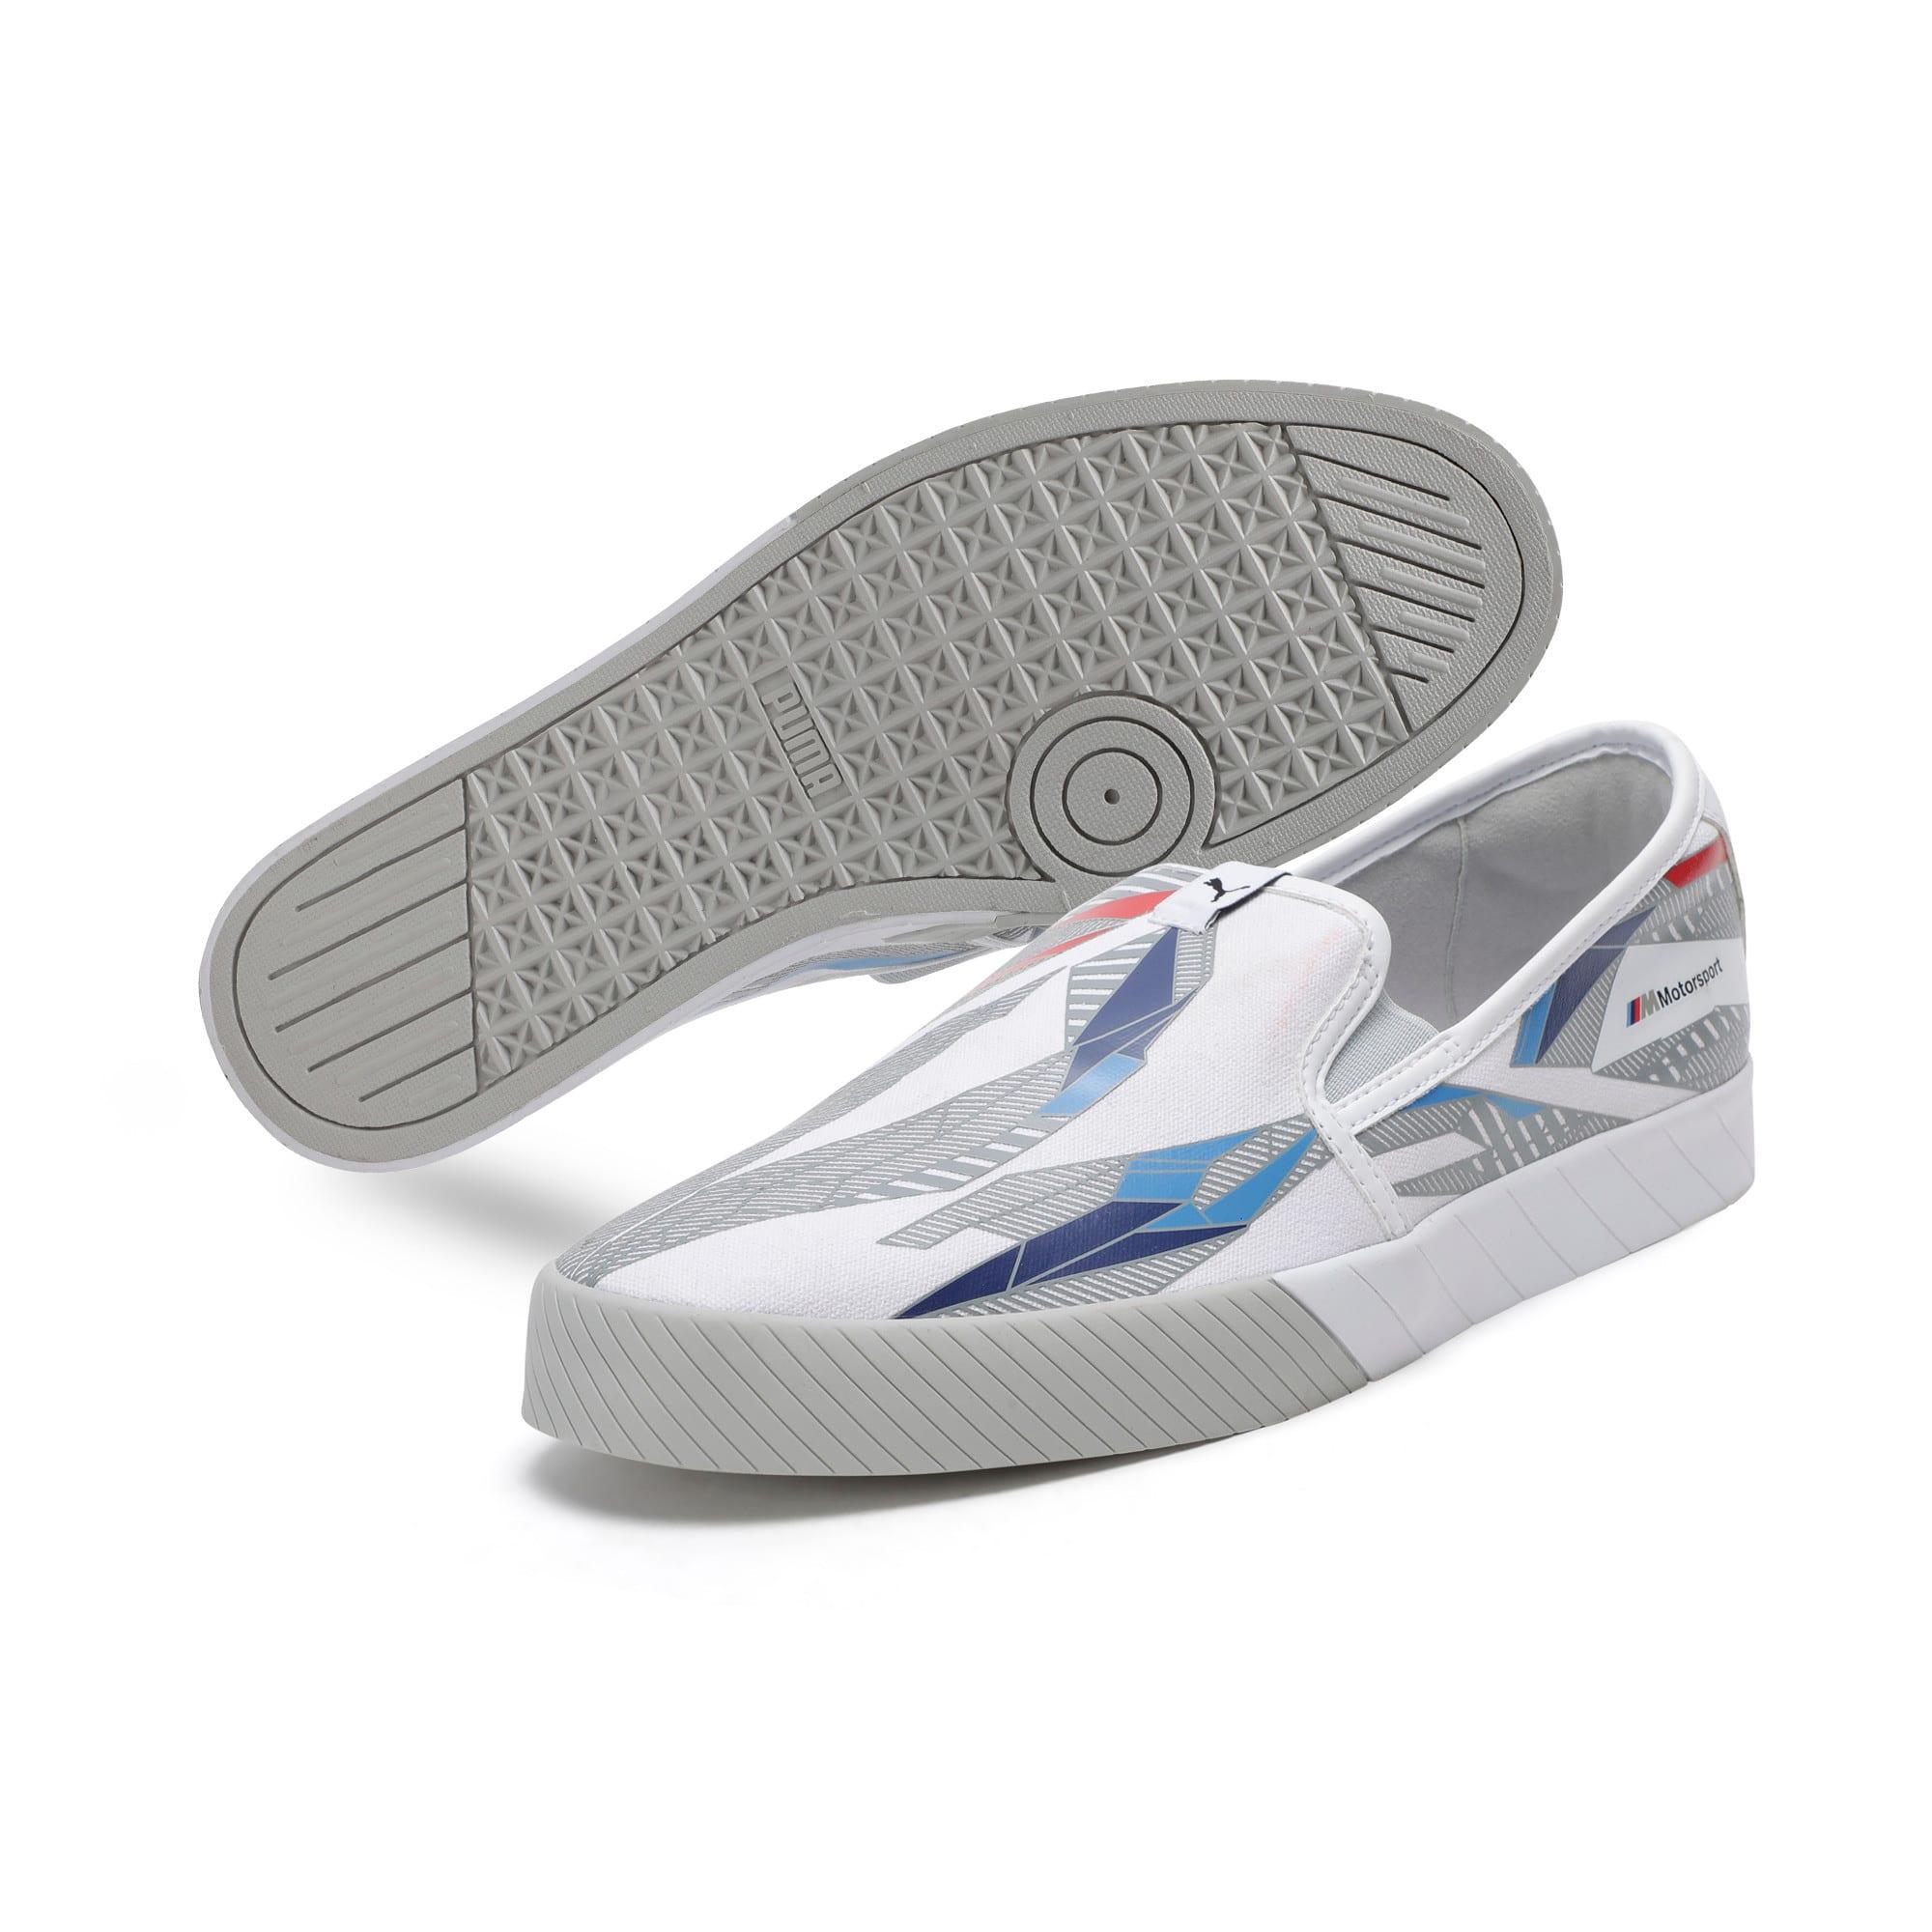 Thumbnail 4 of BMW M Slip-On Track Shoes, Puma White-Gray Violet, medium-IND